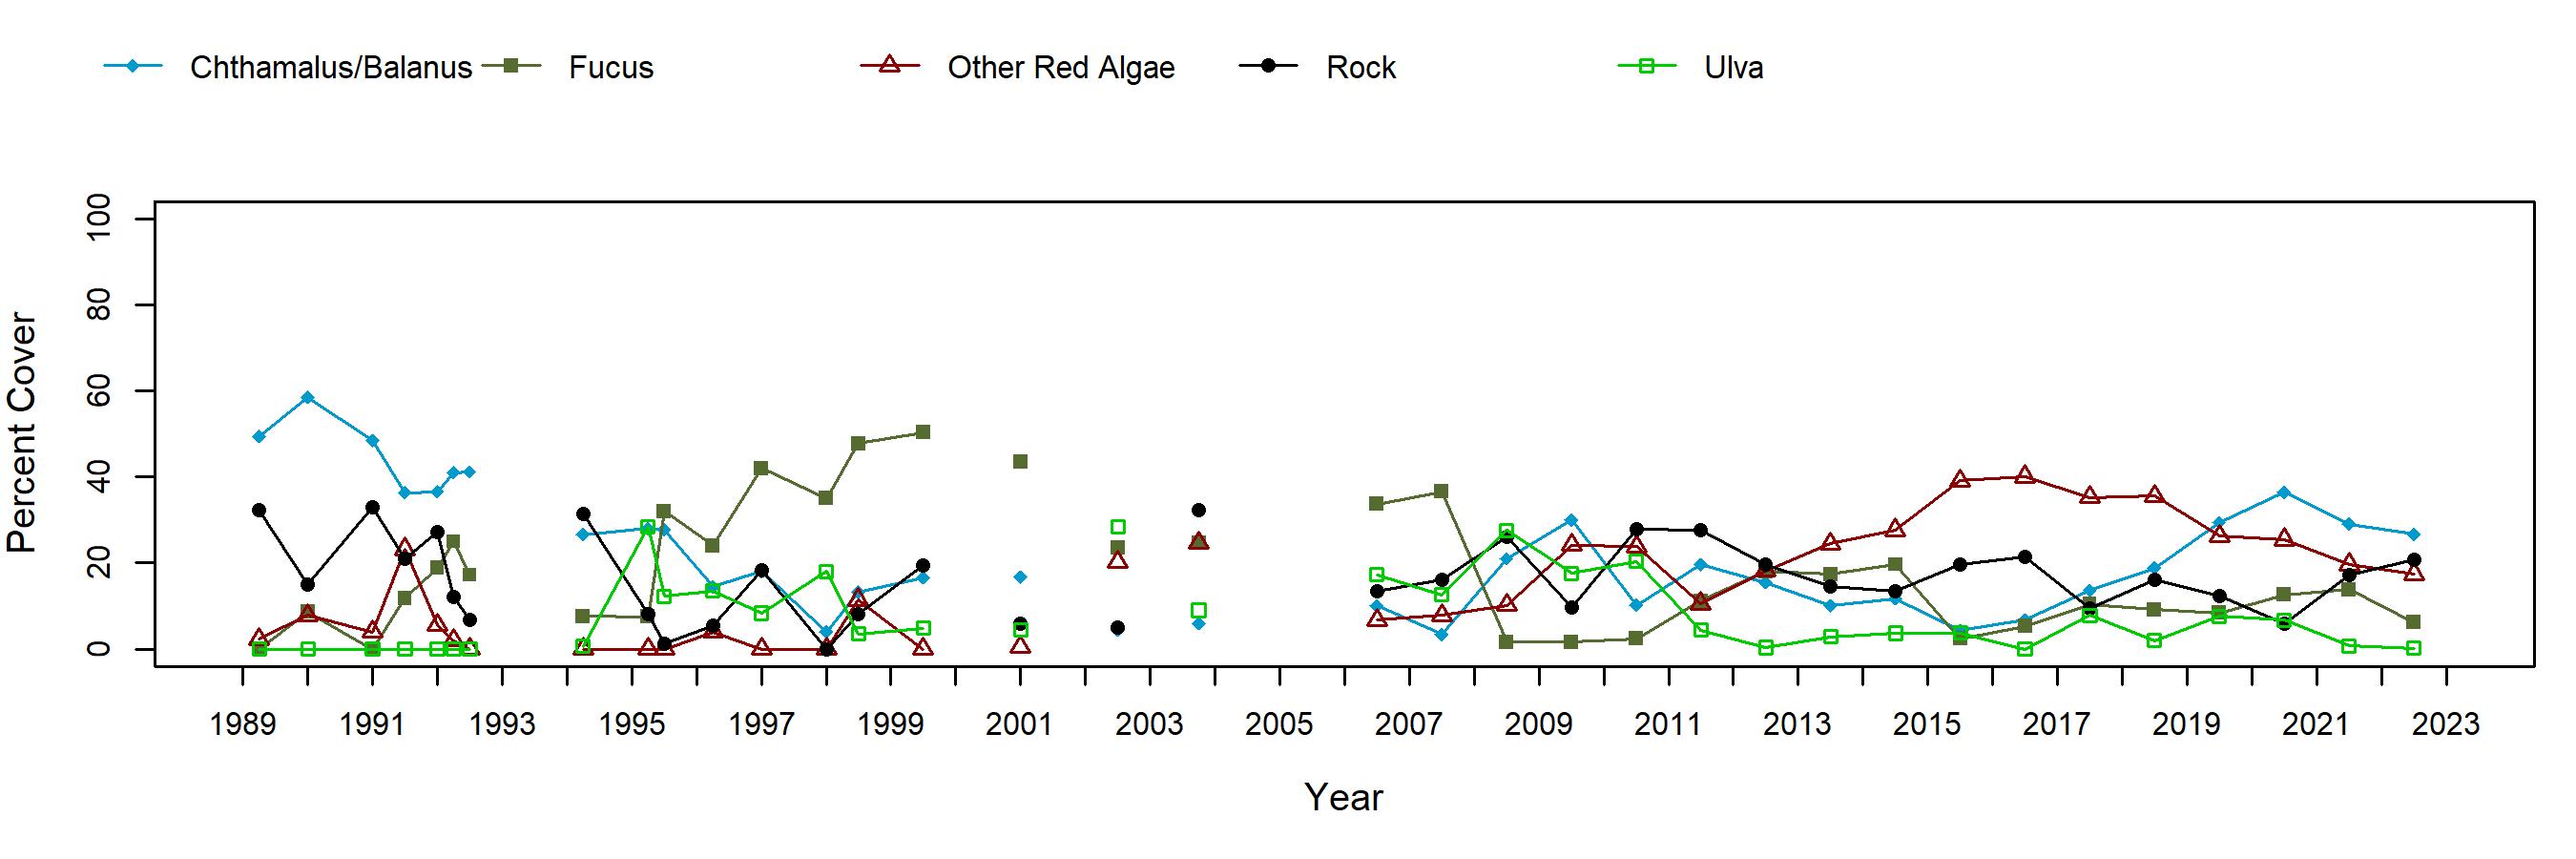 Alcatraz barnacle motiles trend plot